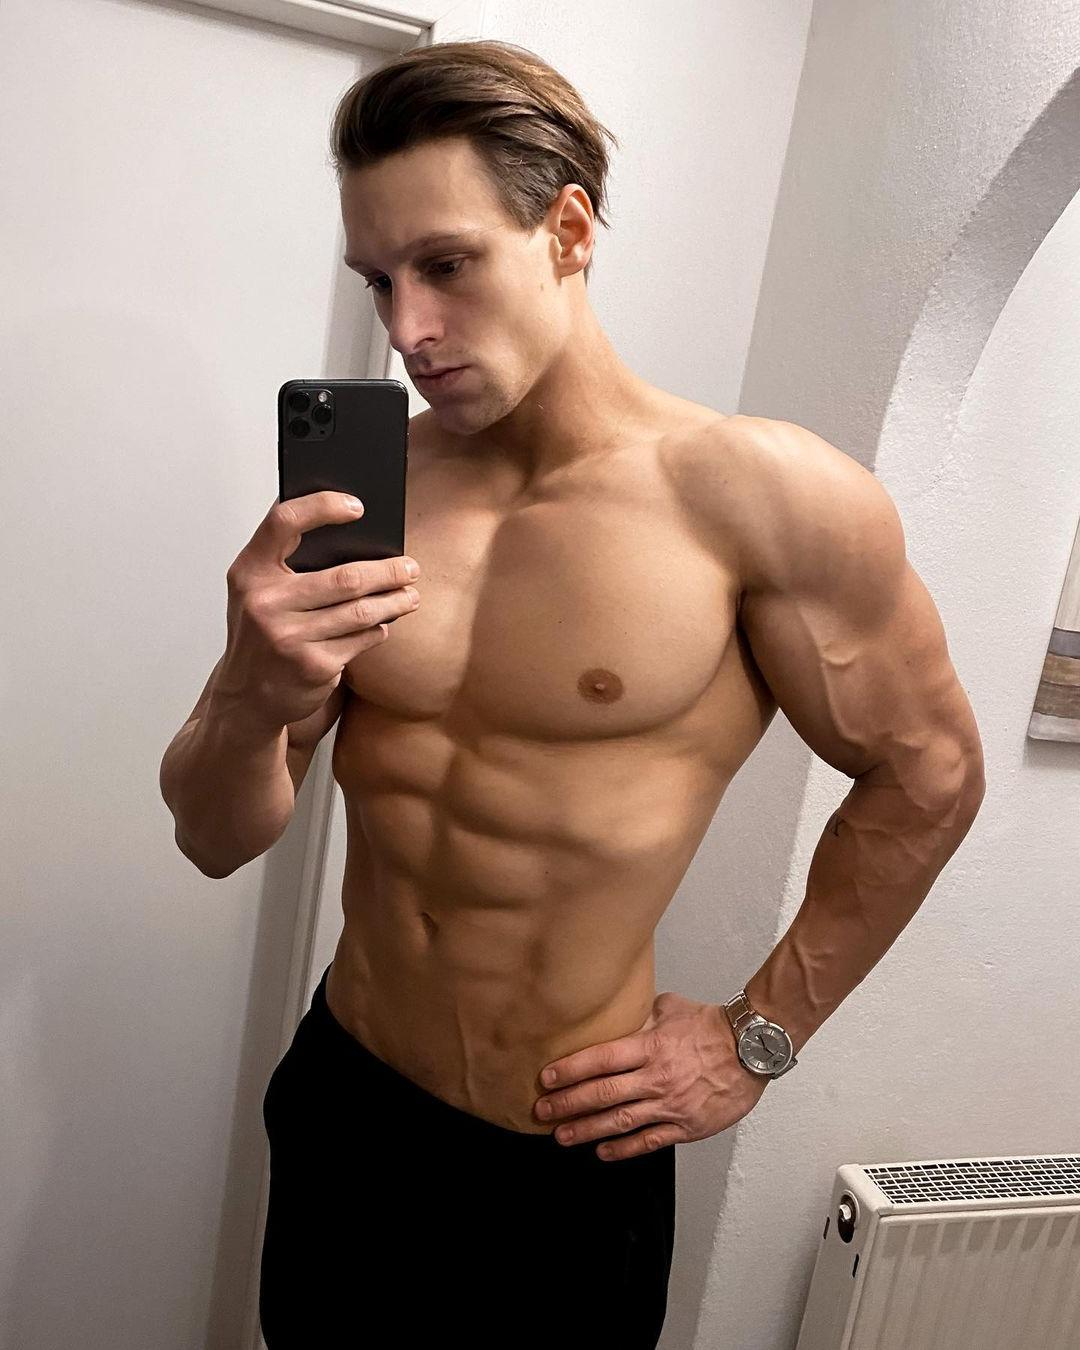 fit-shirtless-hunk-steve-kris-veiny-muscular-body-selfie